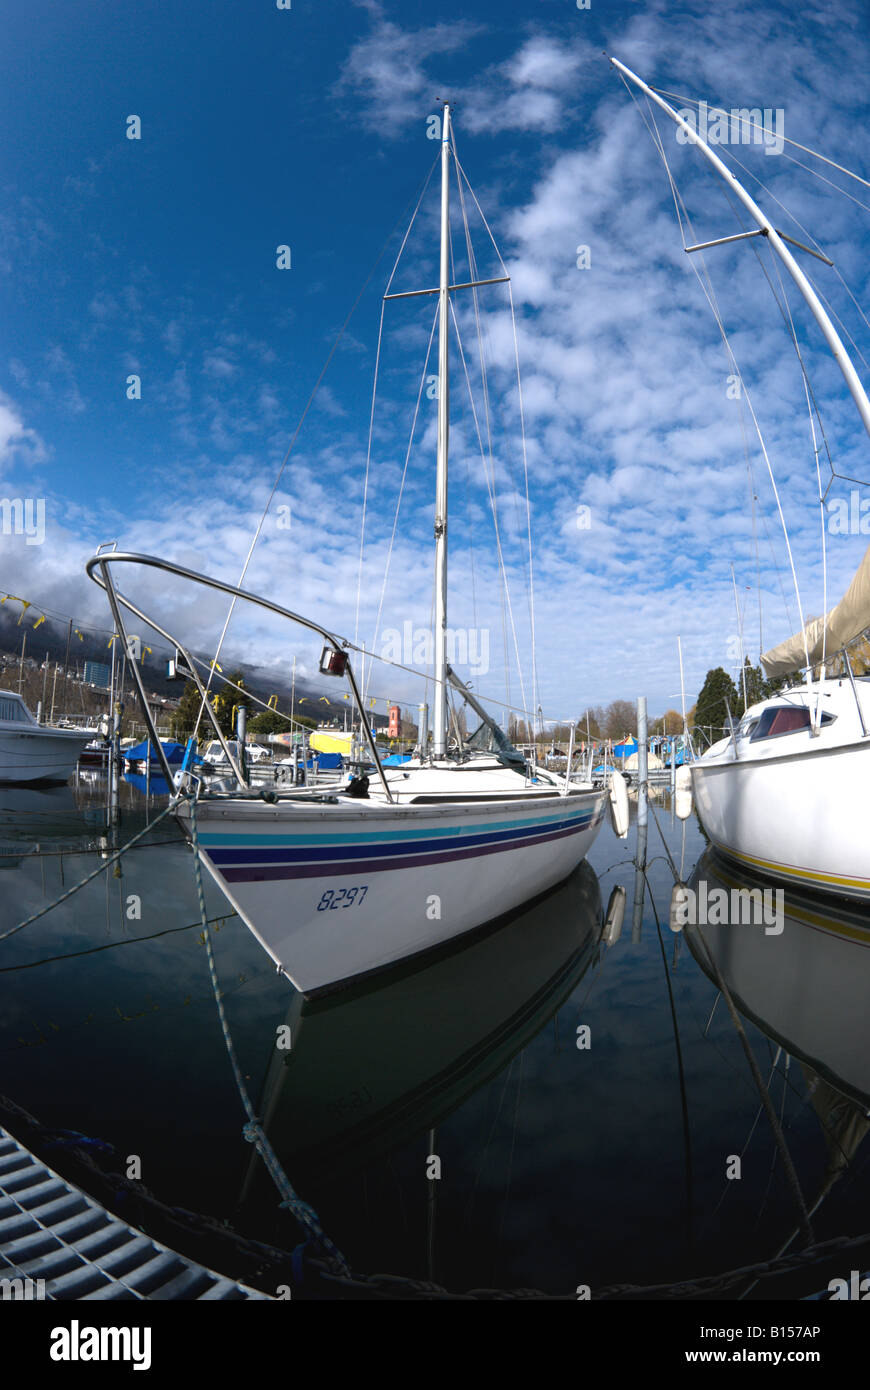 Lac Neuchâtel Switzerland Stock Photos & Lac Neuchâtel